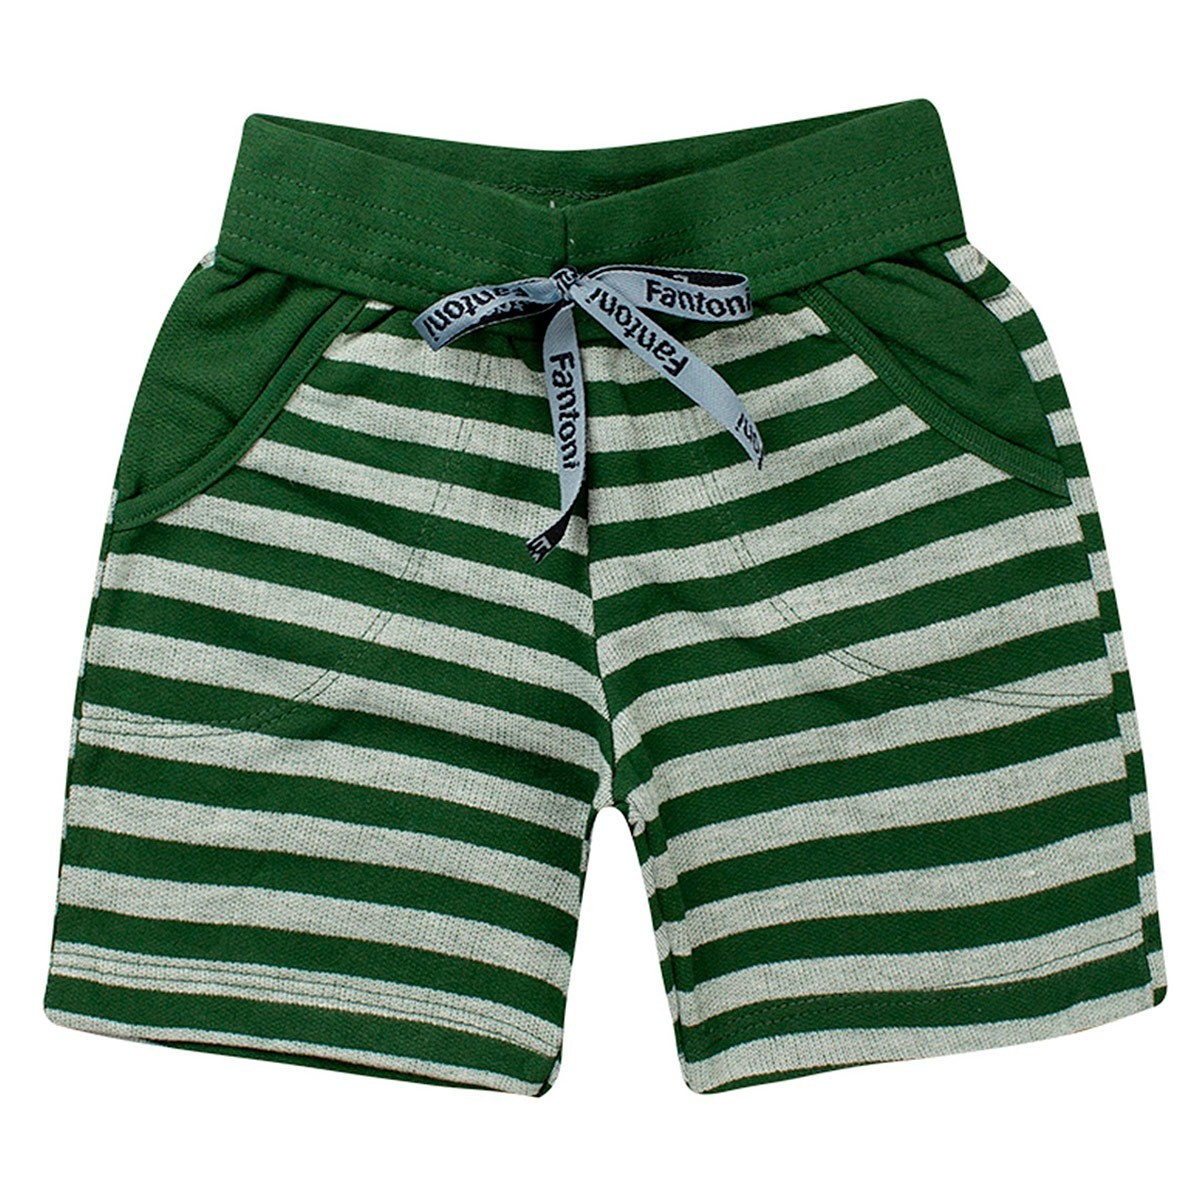 Bermuda Infantil Menino Verão Listrada Verde - Fantoni